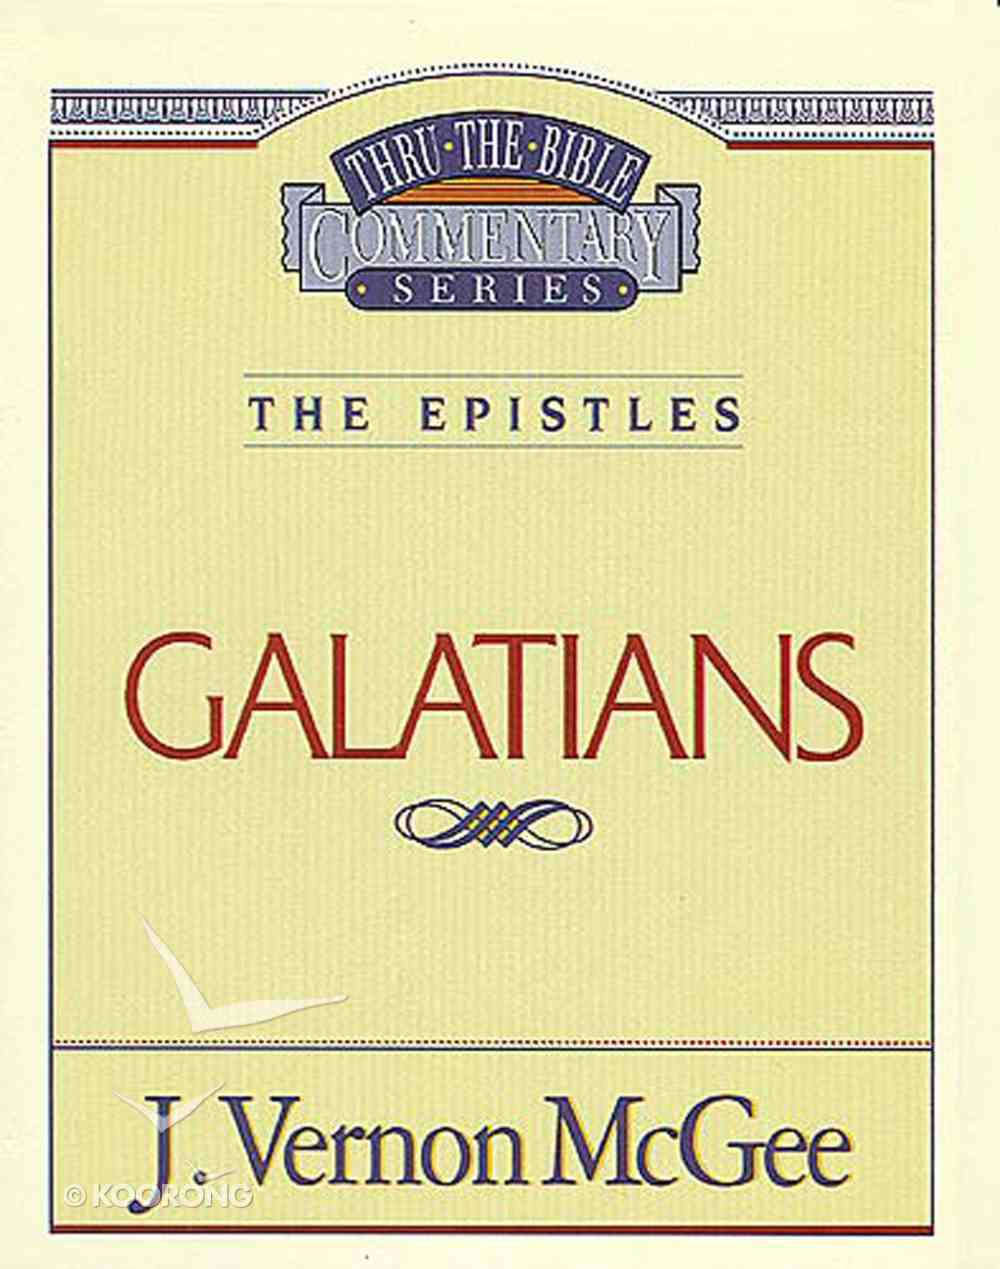 Thru the Bible NT #46: Galatians (#46 in Thru The Bible New Testament Series) Paperback